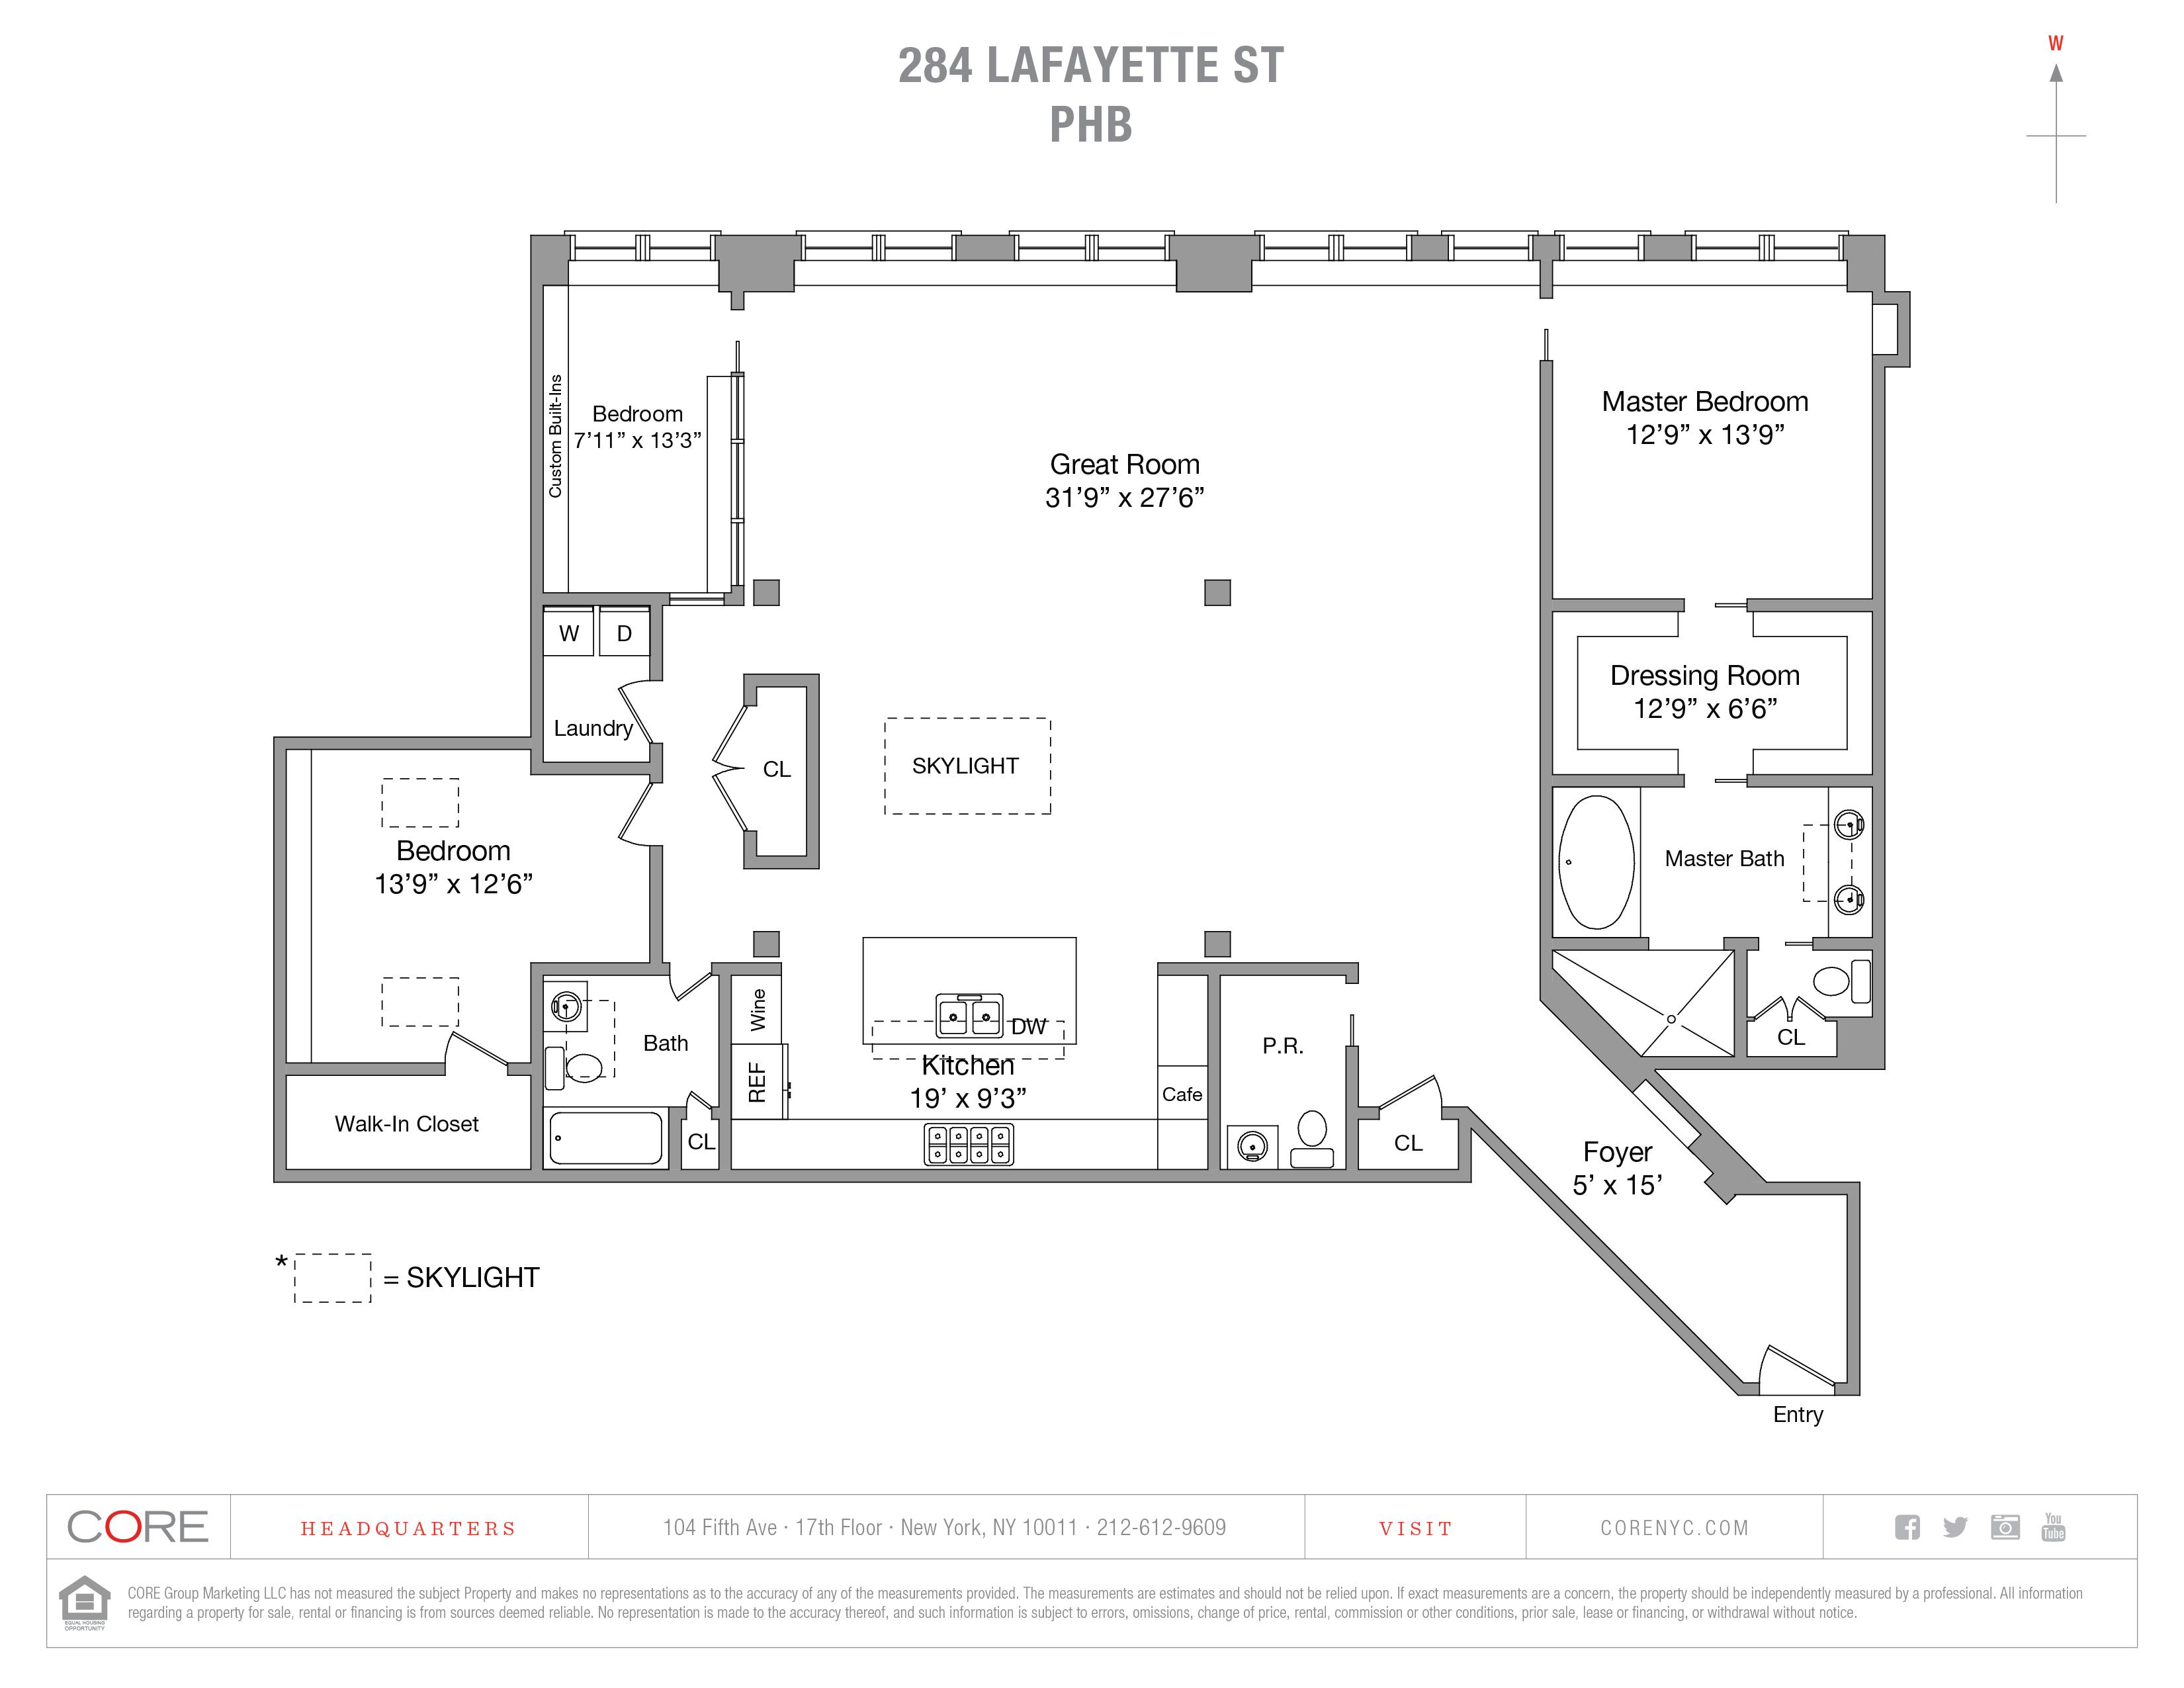 284 Lafayette St. PH-B, New York, NY 10012